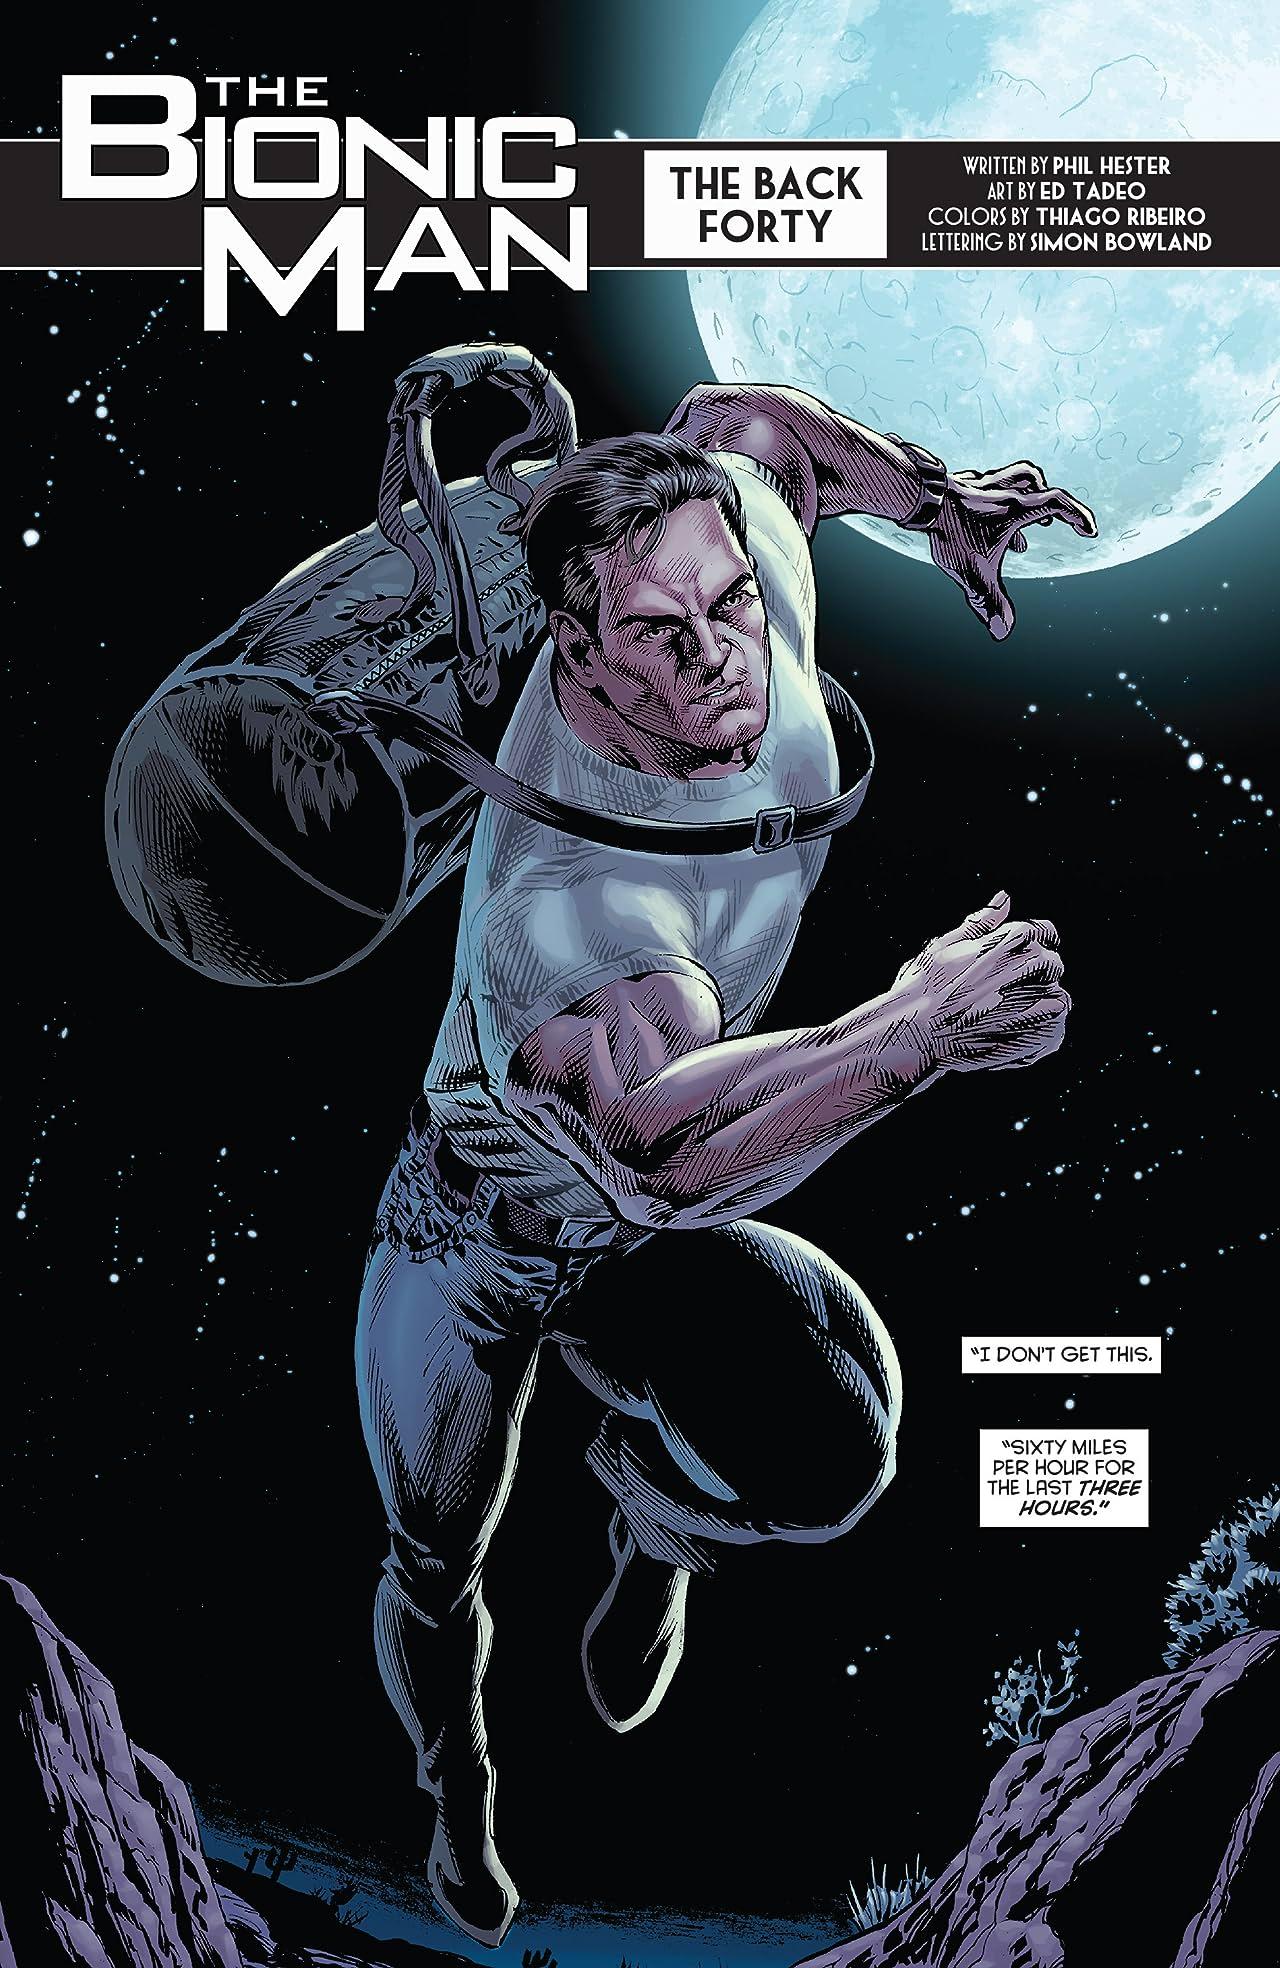 The Bionic Man #11